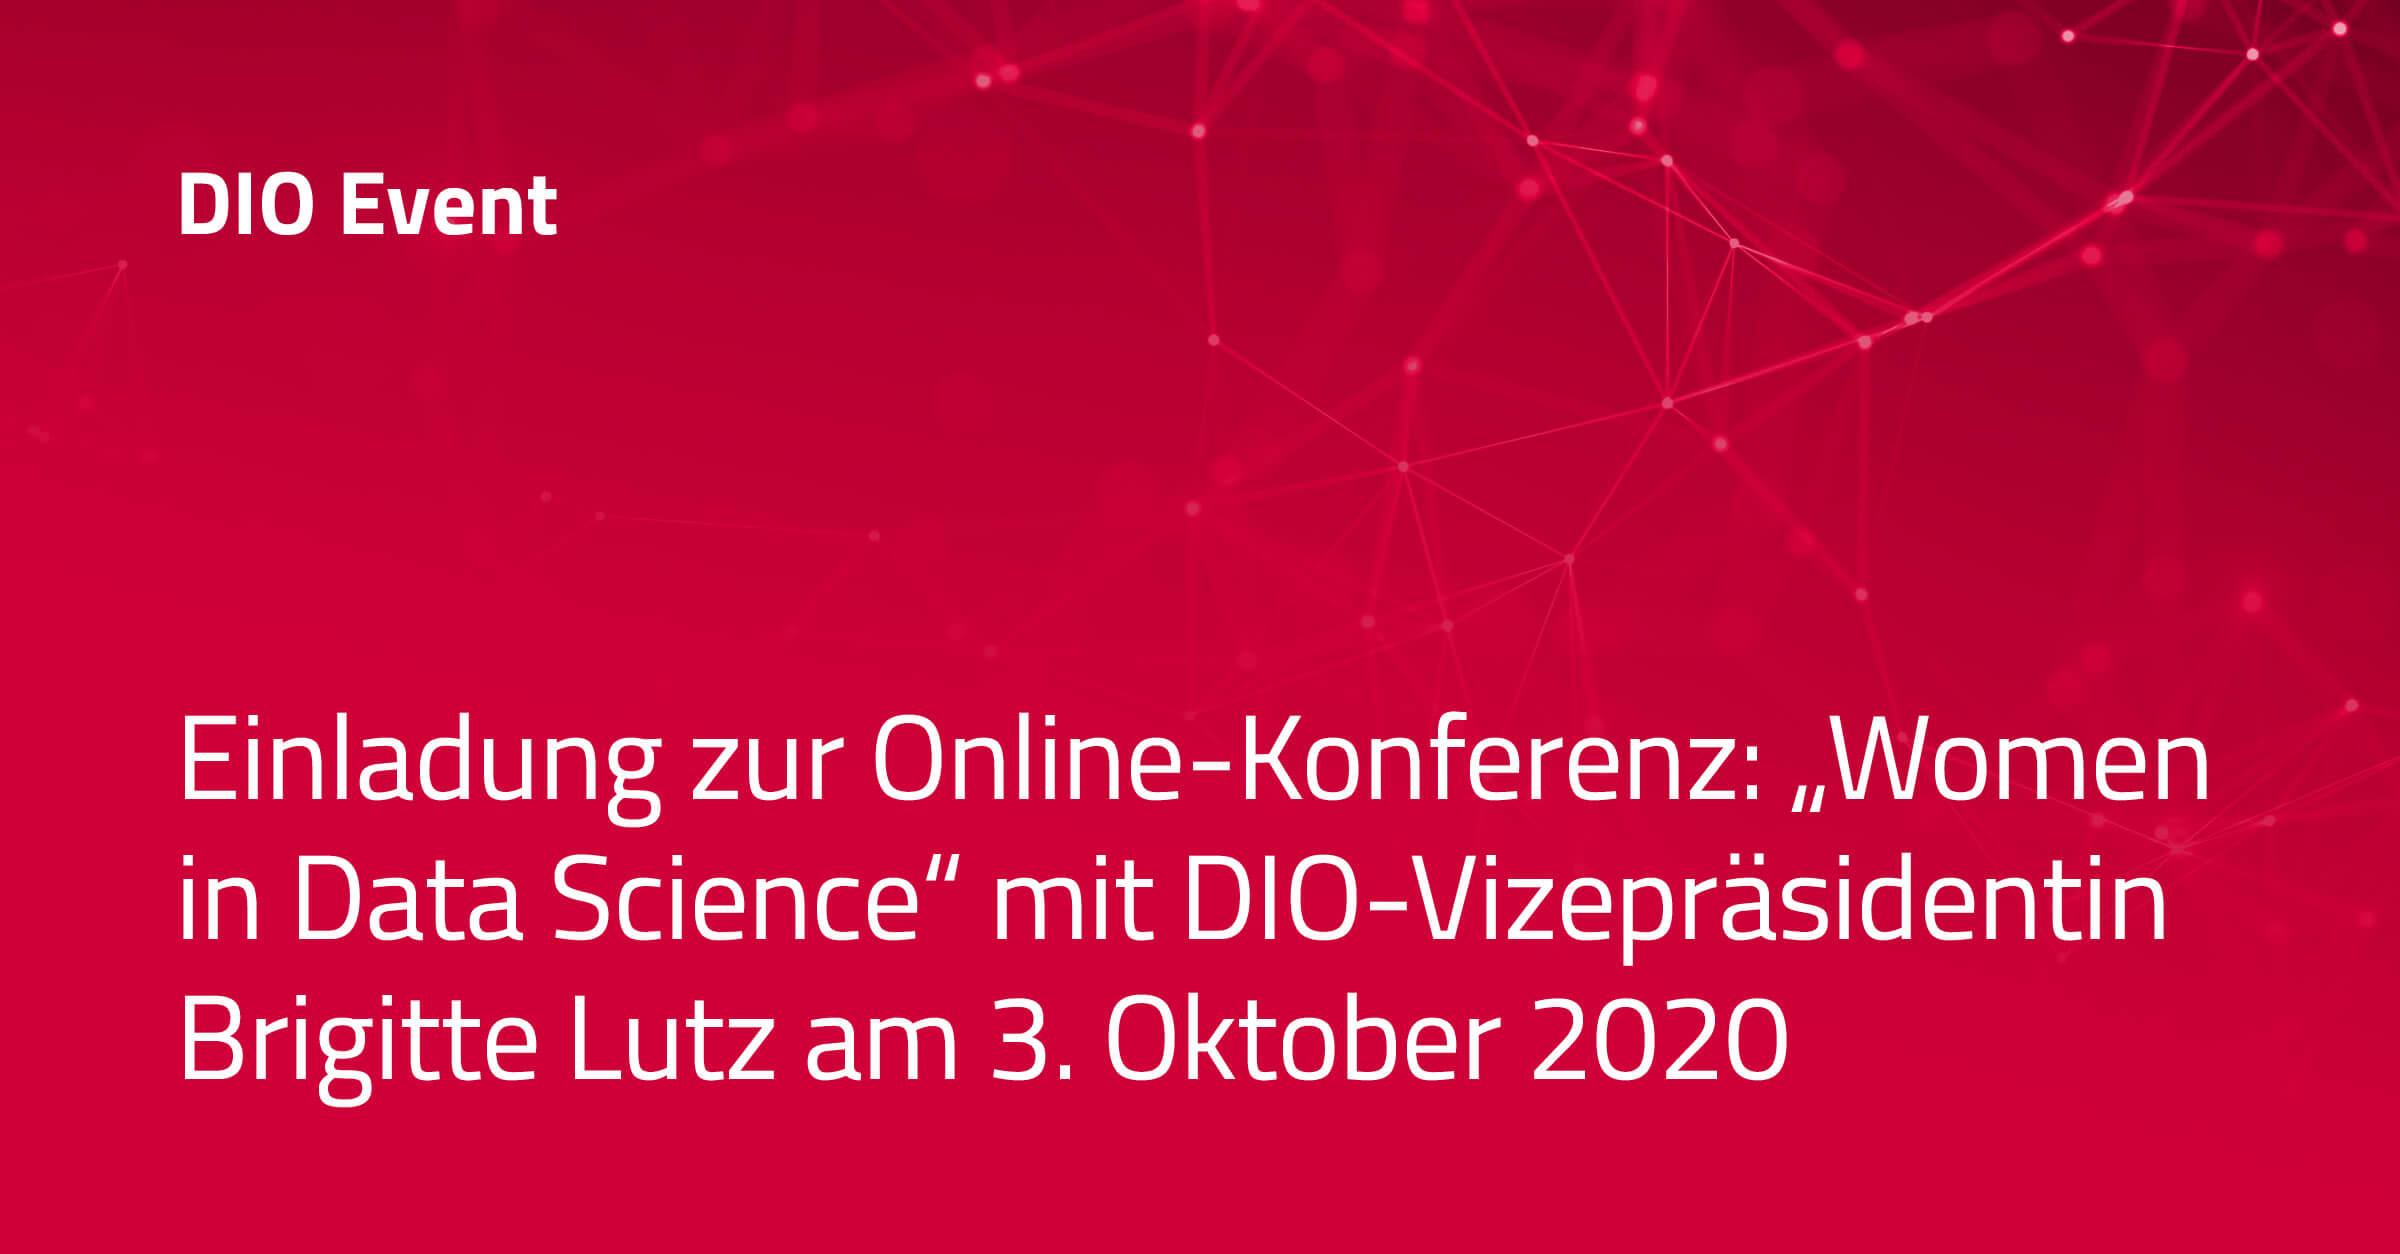 DIO_Event_EinladungWomeninDataScience